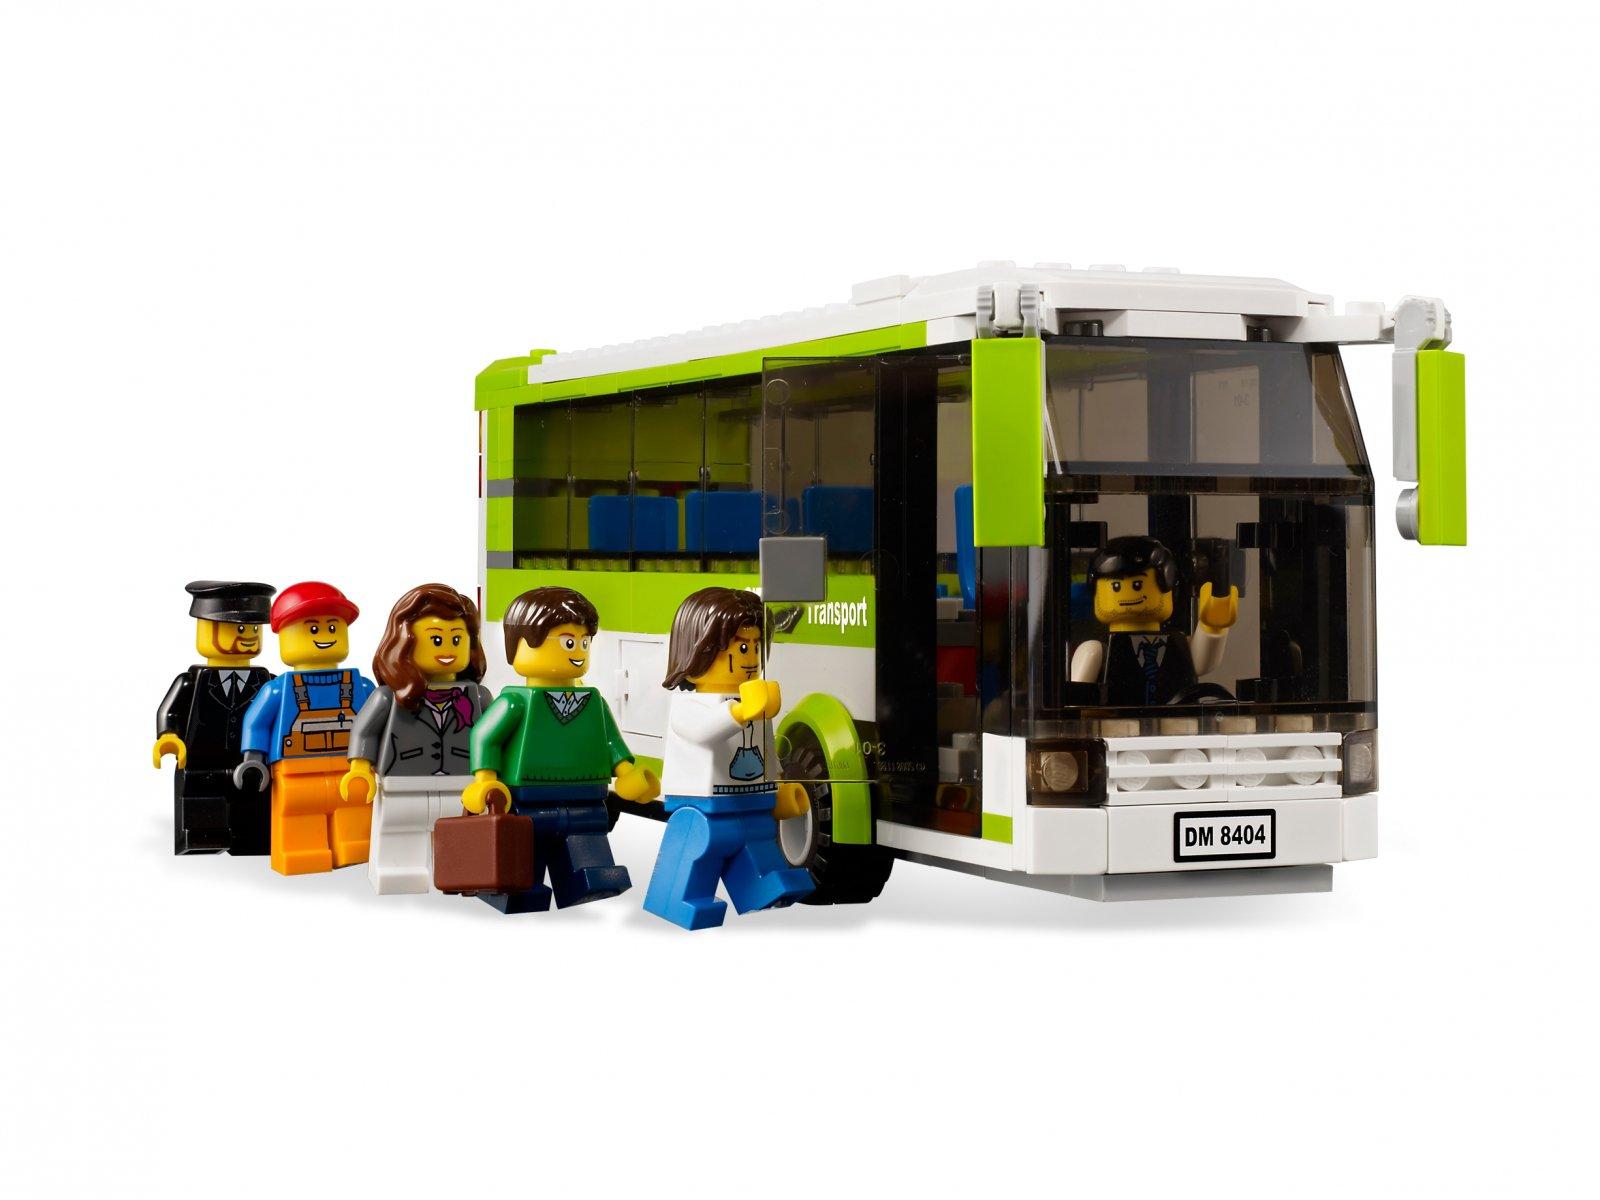 LEGO City 8404 Public Transport